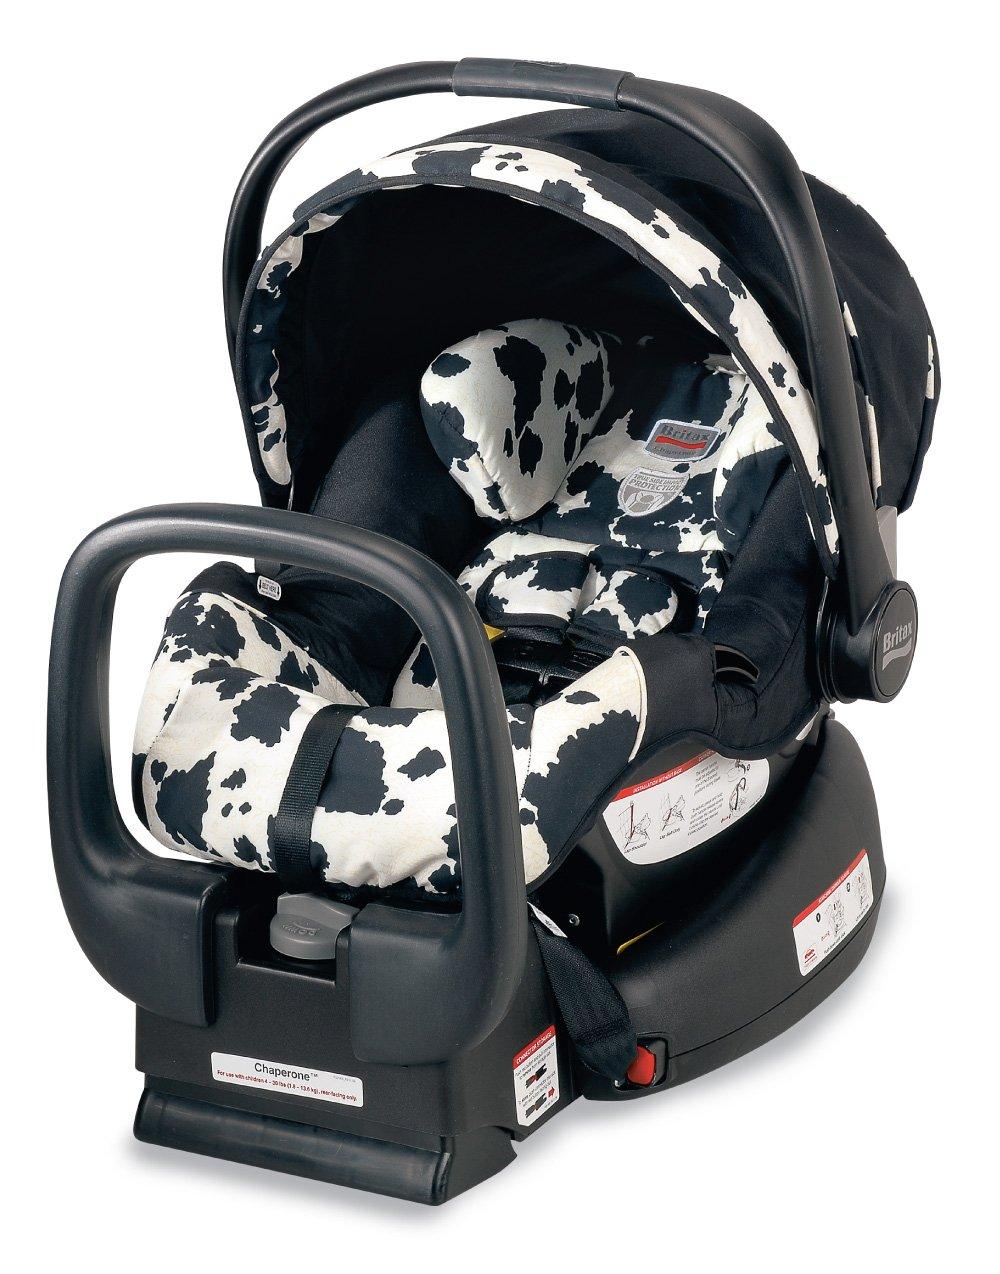 Amazon.com: Britax Chaperone Infant Car Seat, Cowmooflage (Prior Model):  Baby